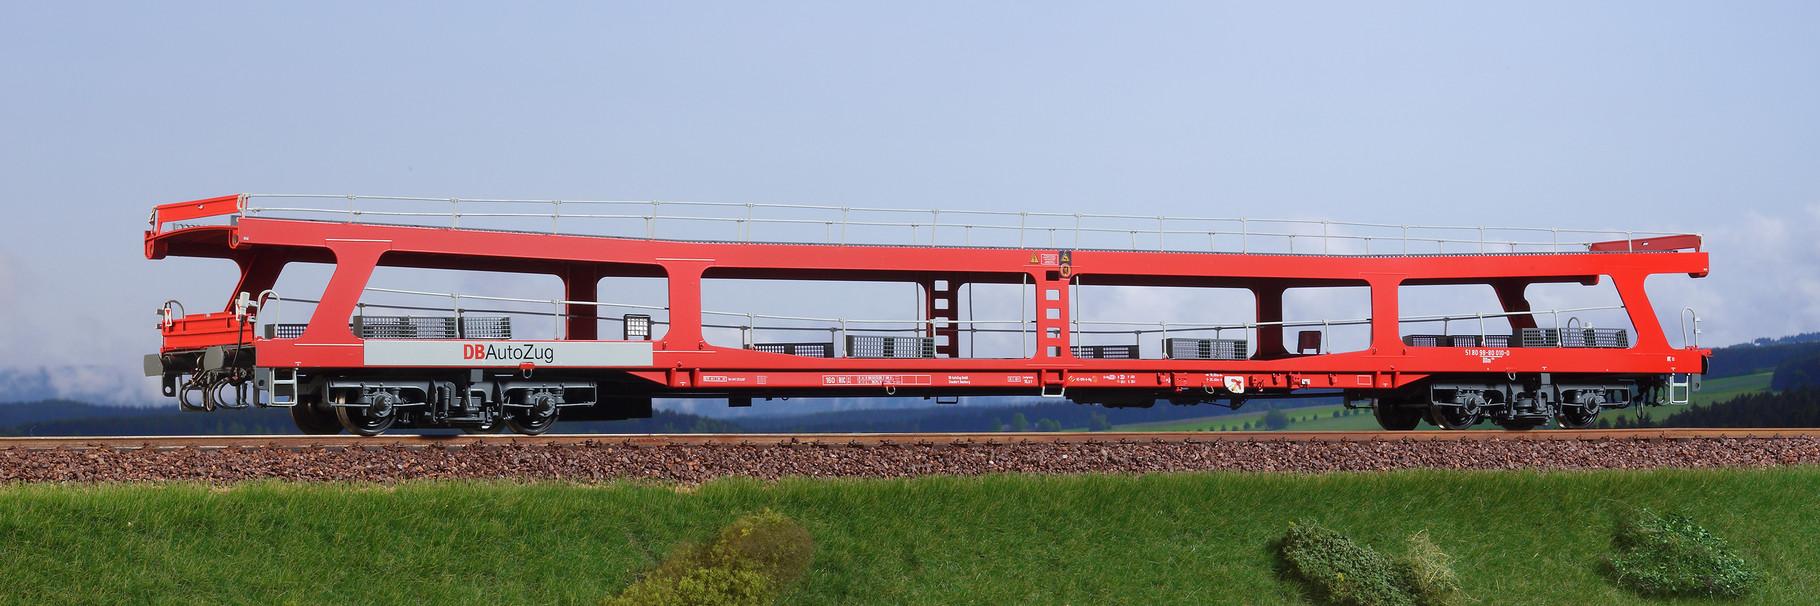 Spur 0, DB Autotransportwaggon DDm 915, orientrot, Epoche IV